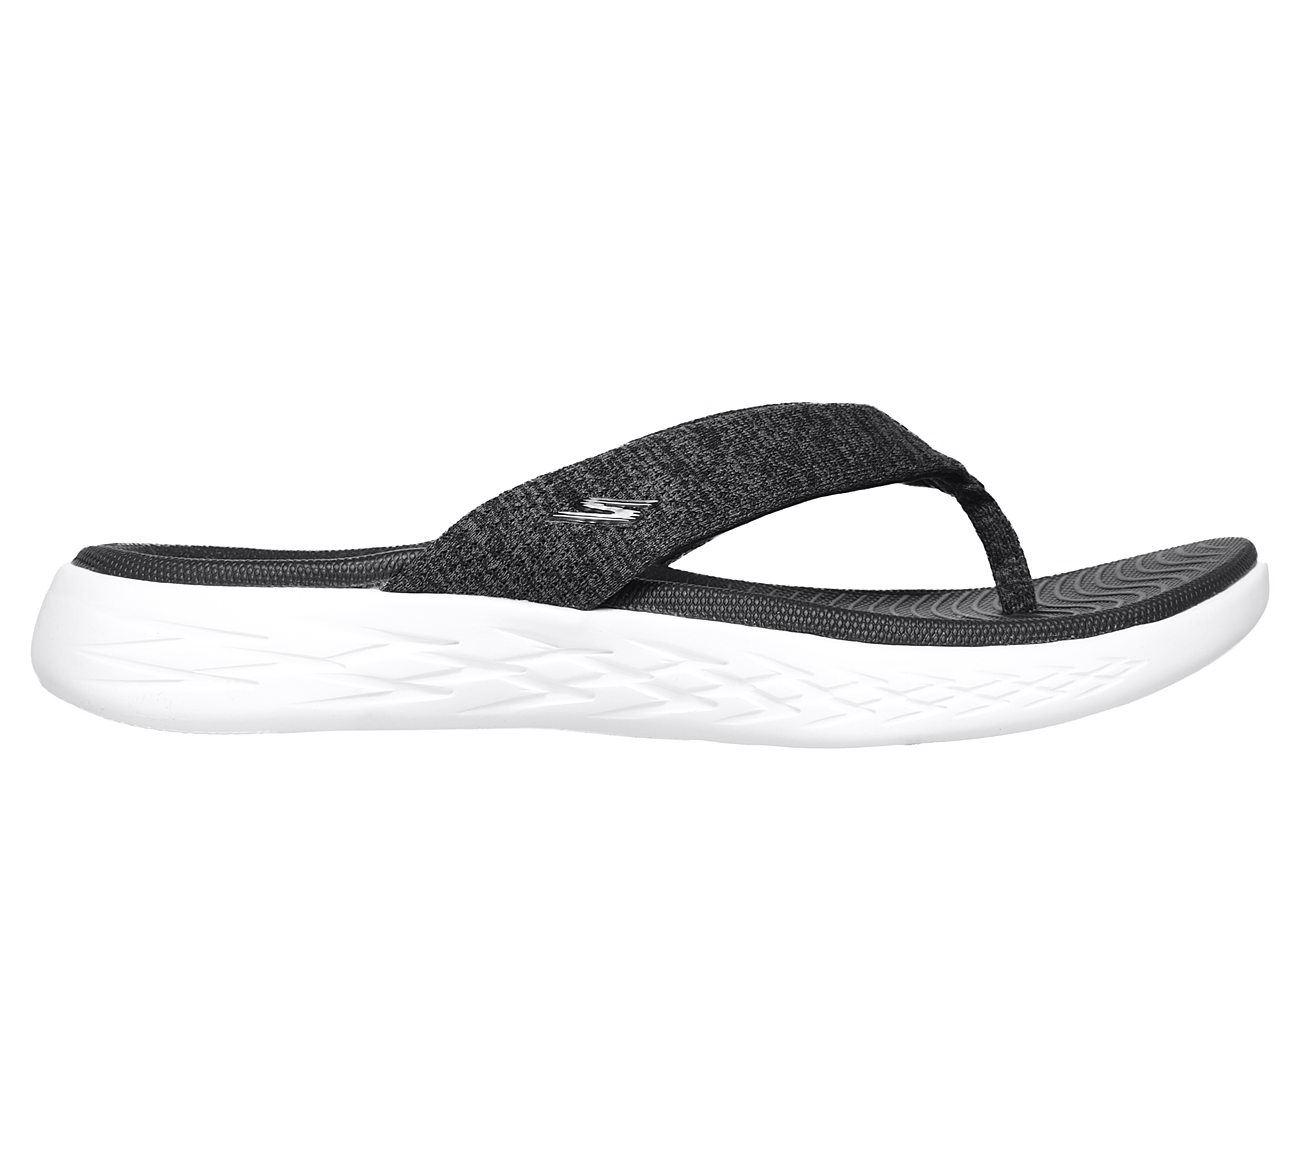 019156494ca9 Skechers Sandals Performance Women s on the Go 600 Preferred Flip ...